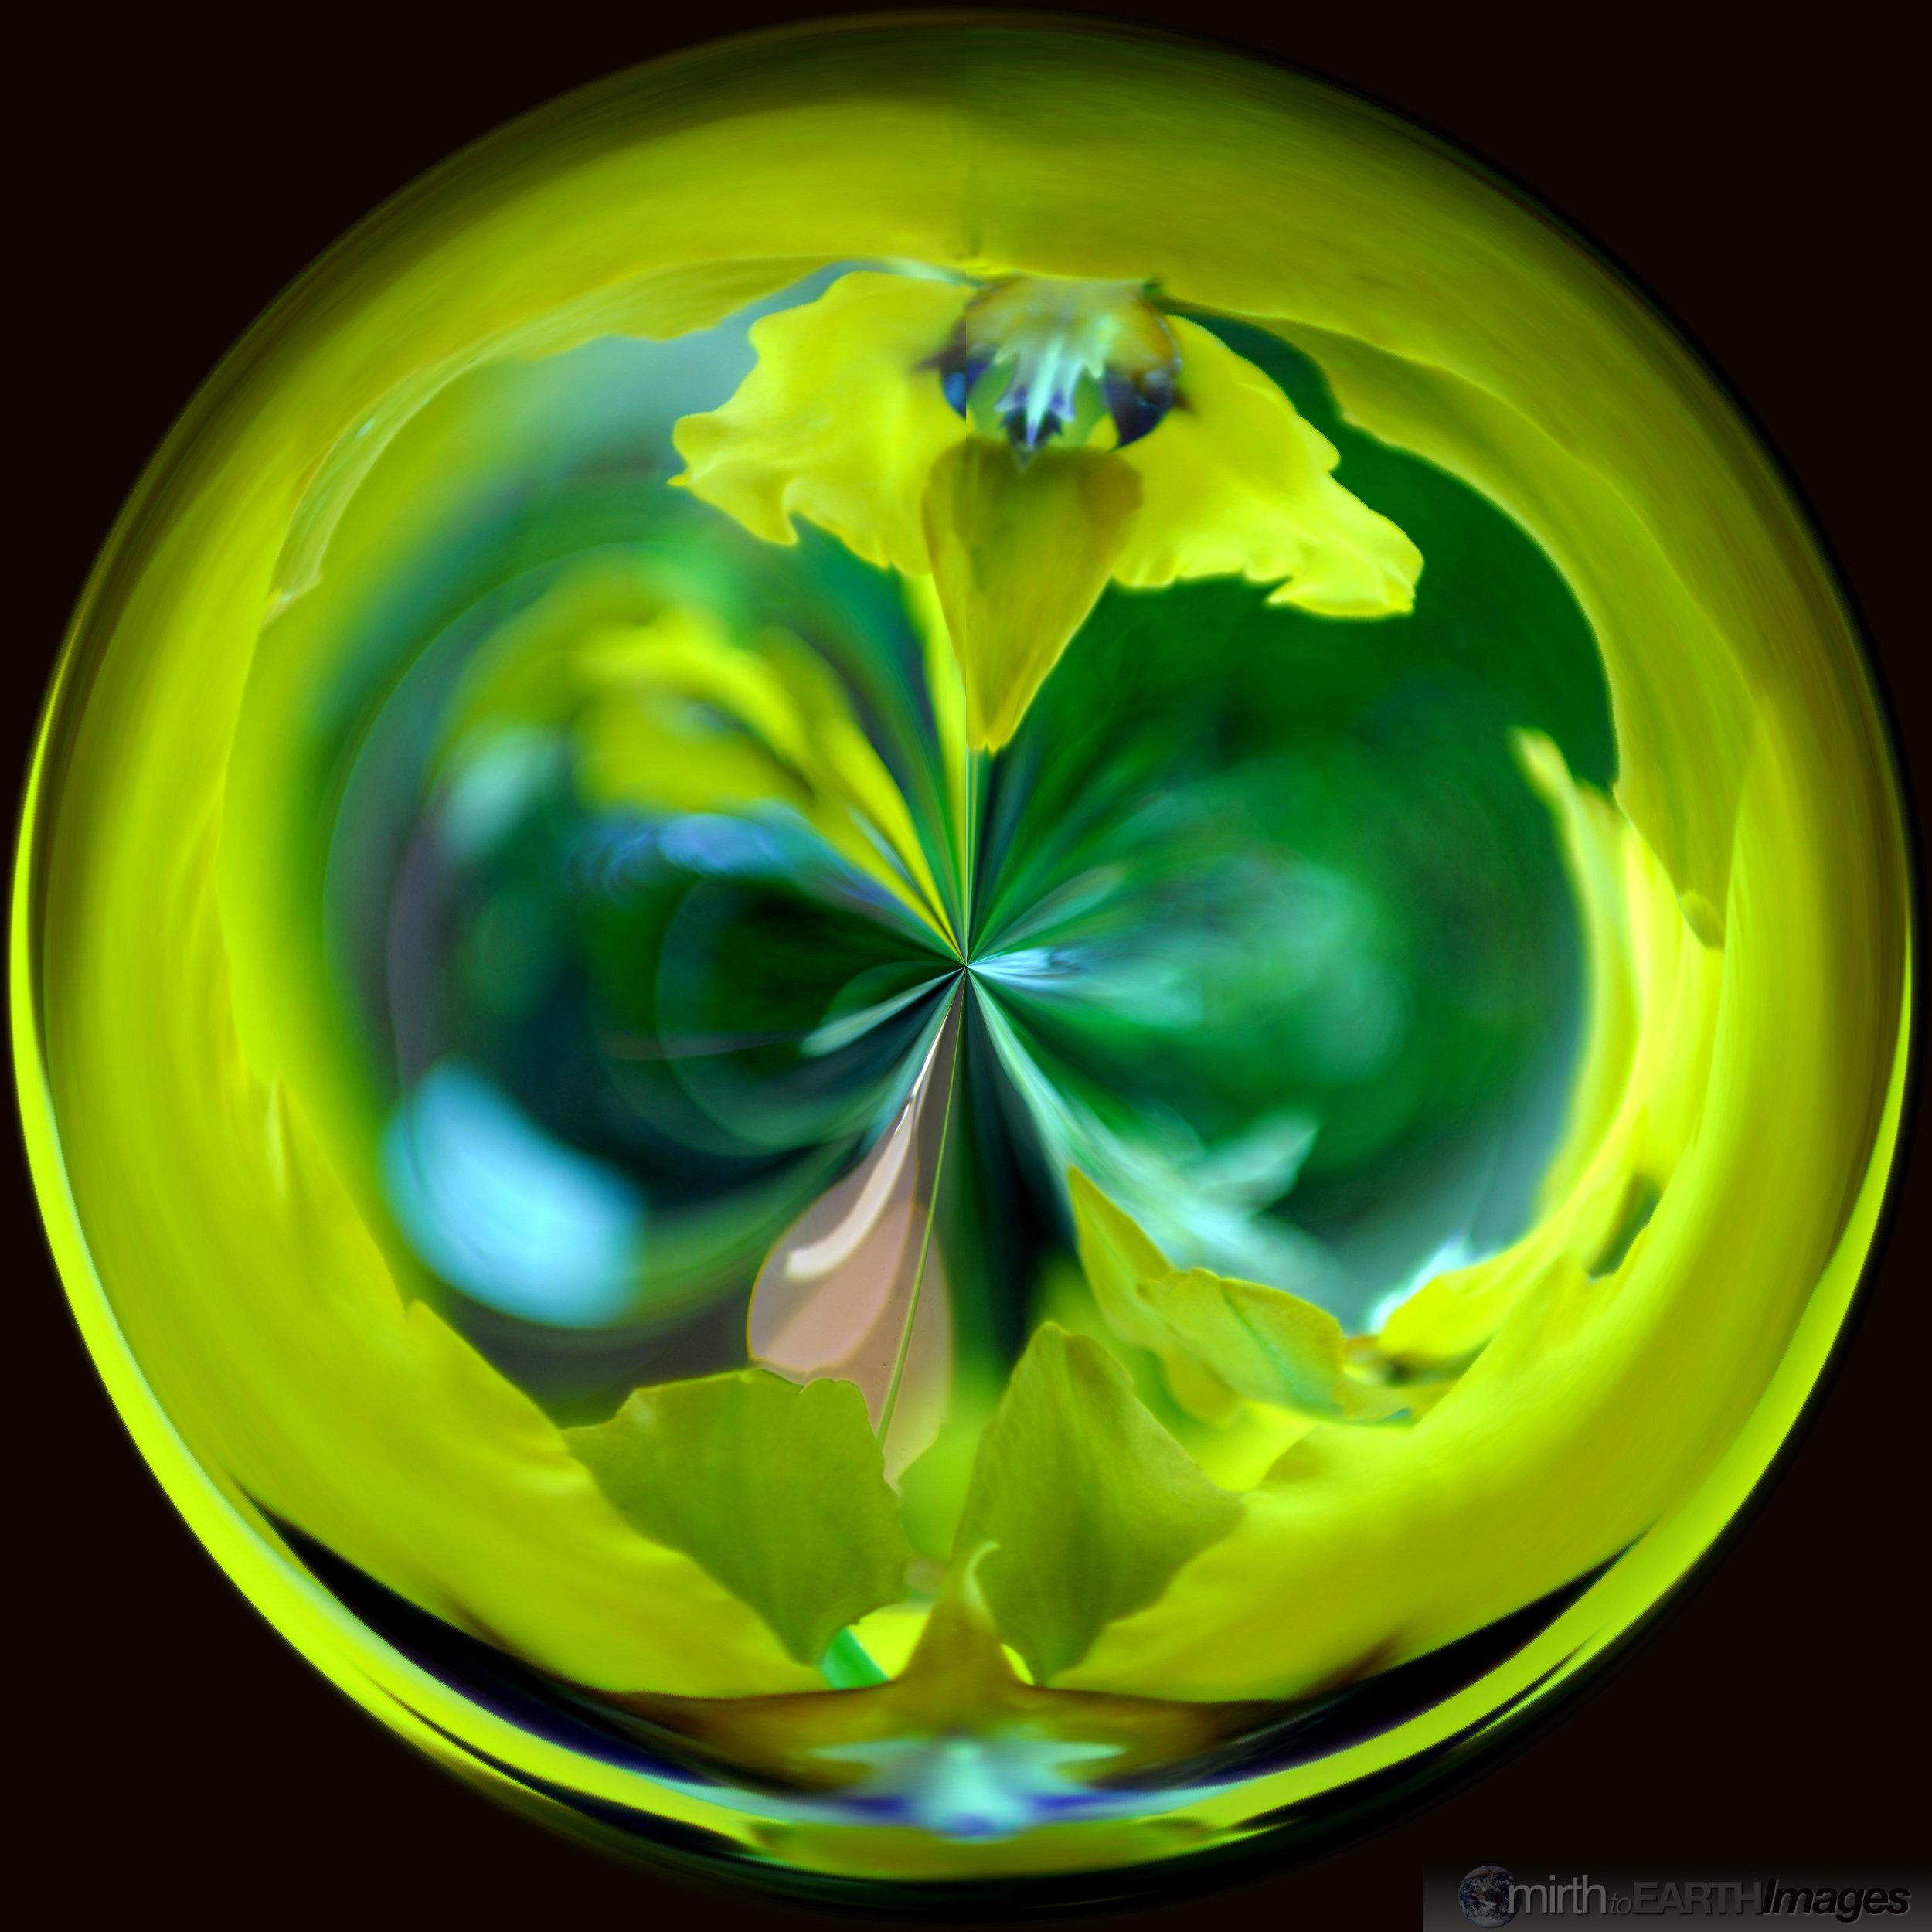 Orchid Orb4576.jpg